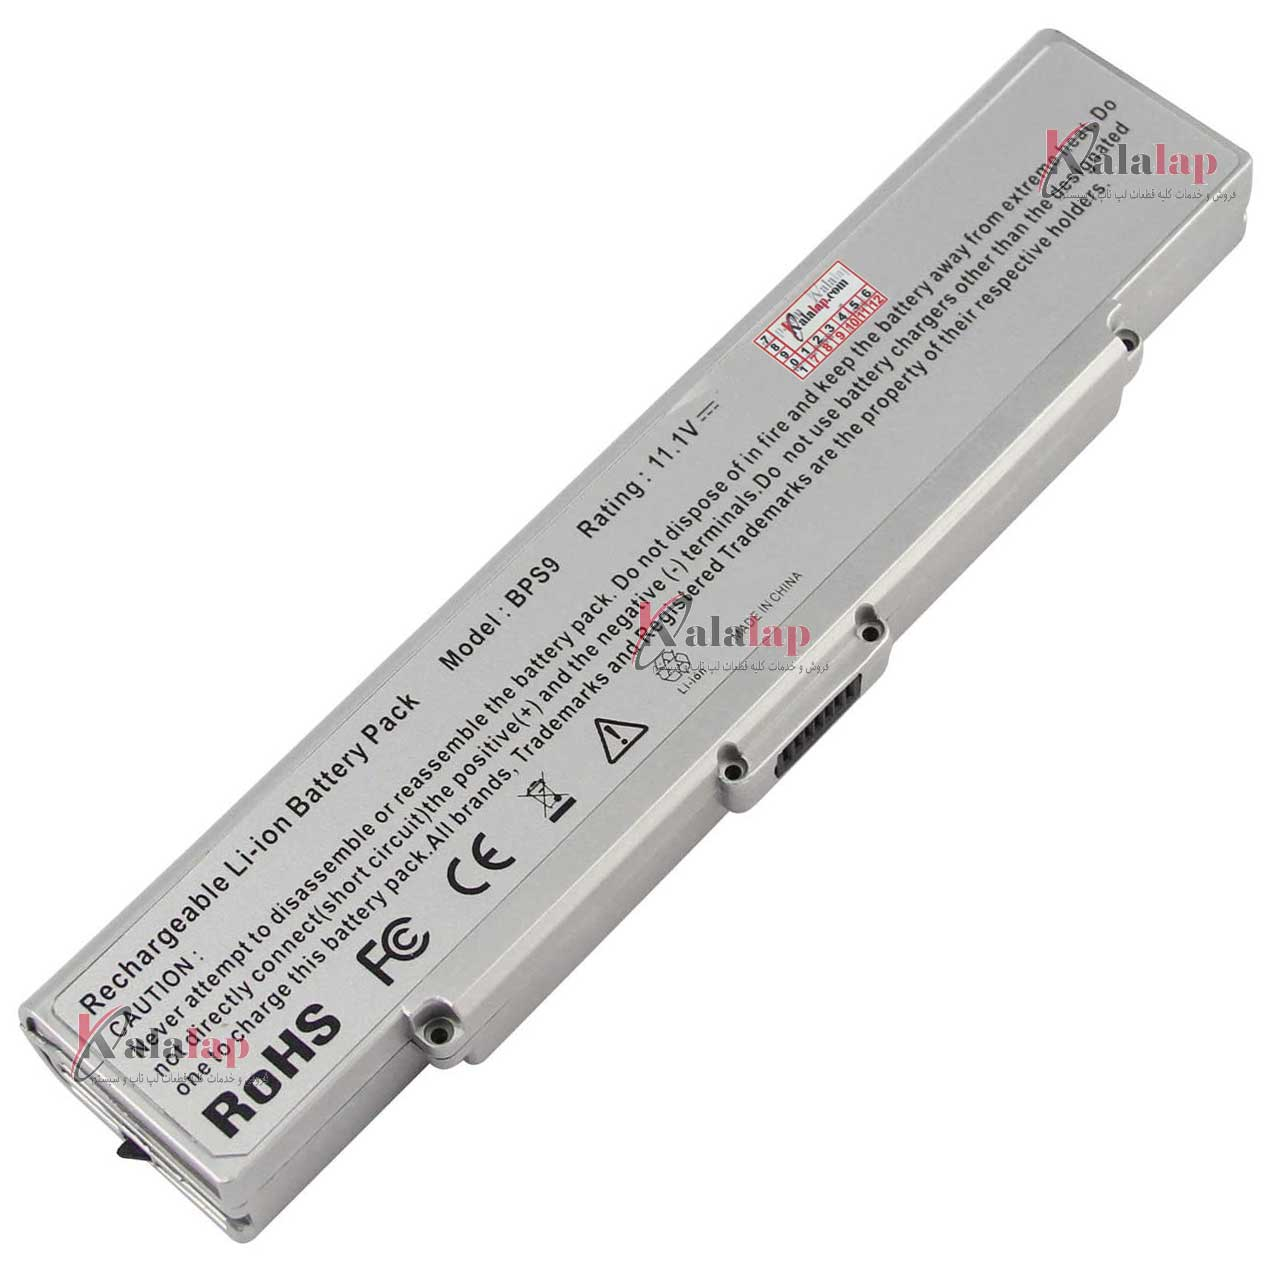 باتری لپتاپ سونی Battery Laptop Sony VGP-BPS9